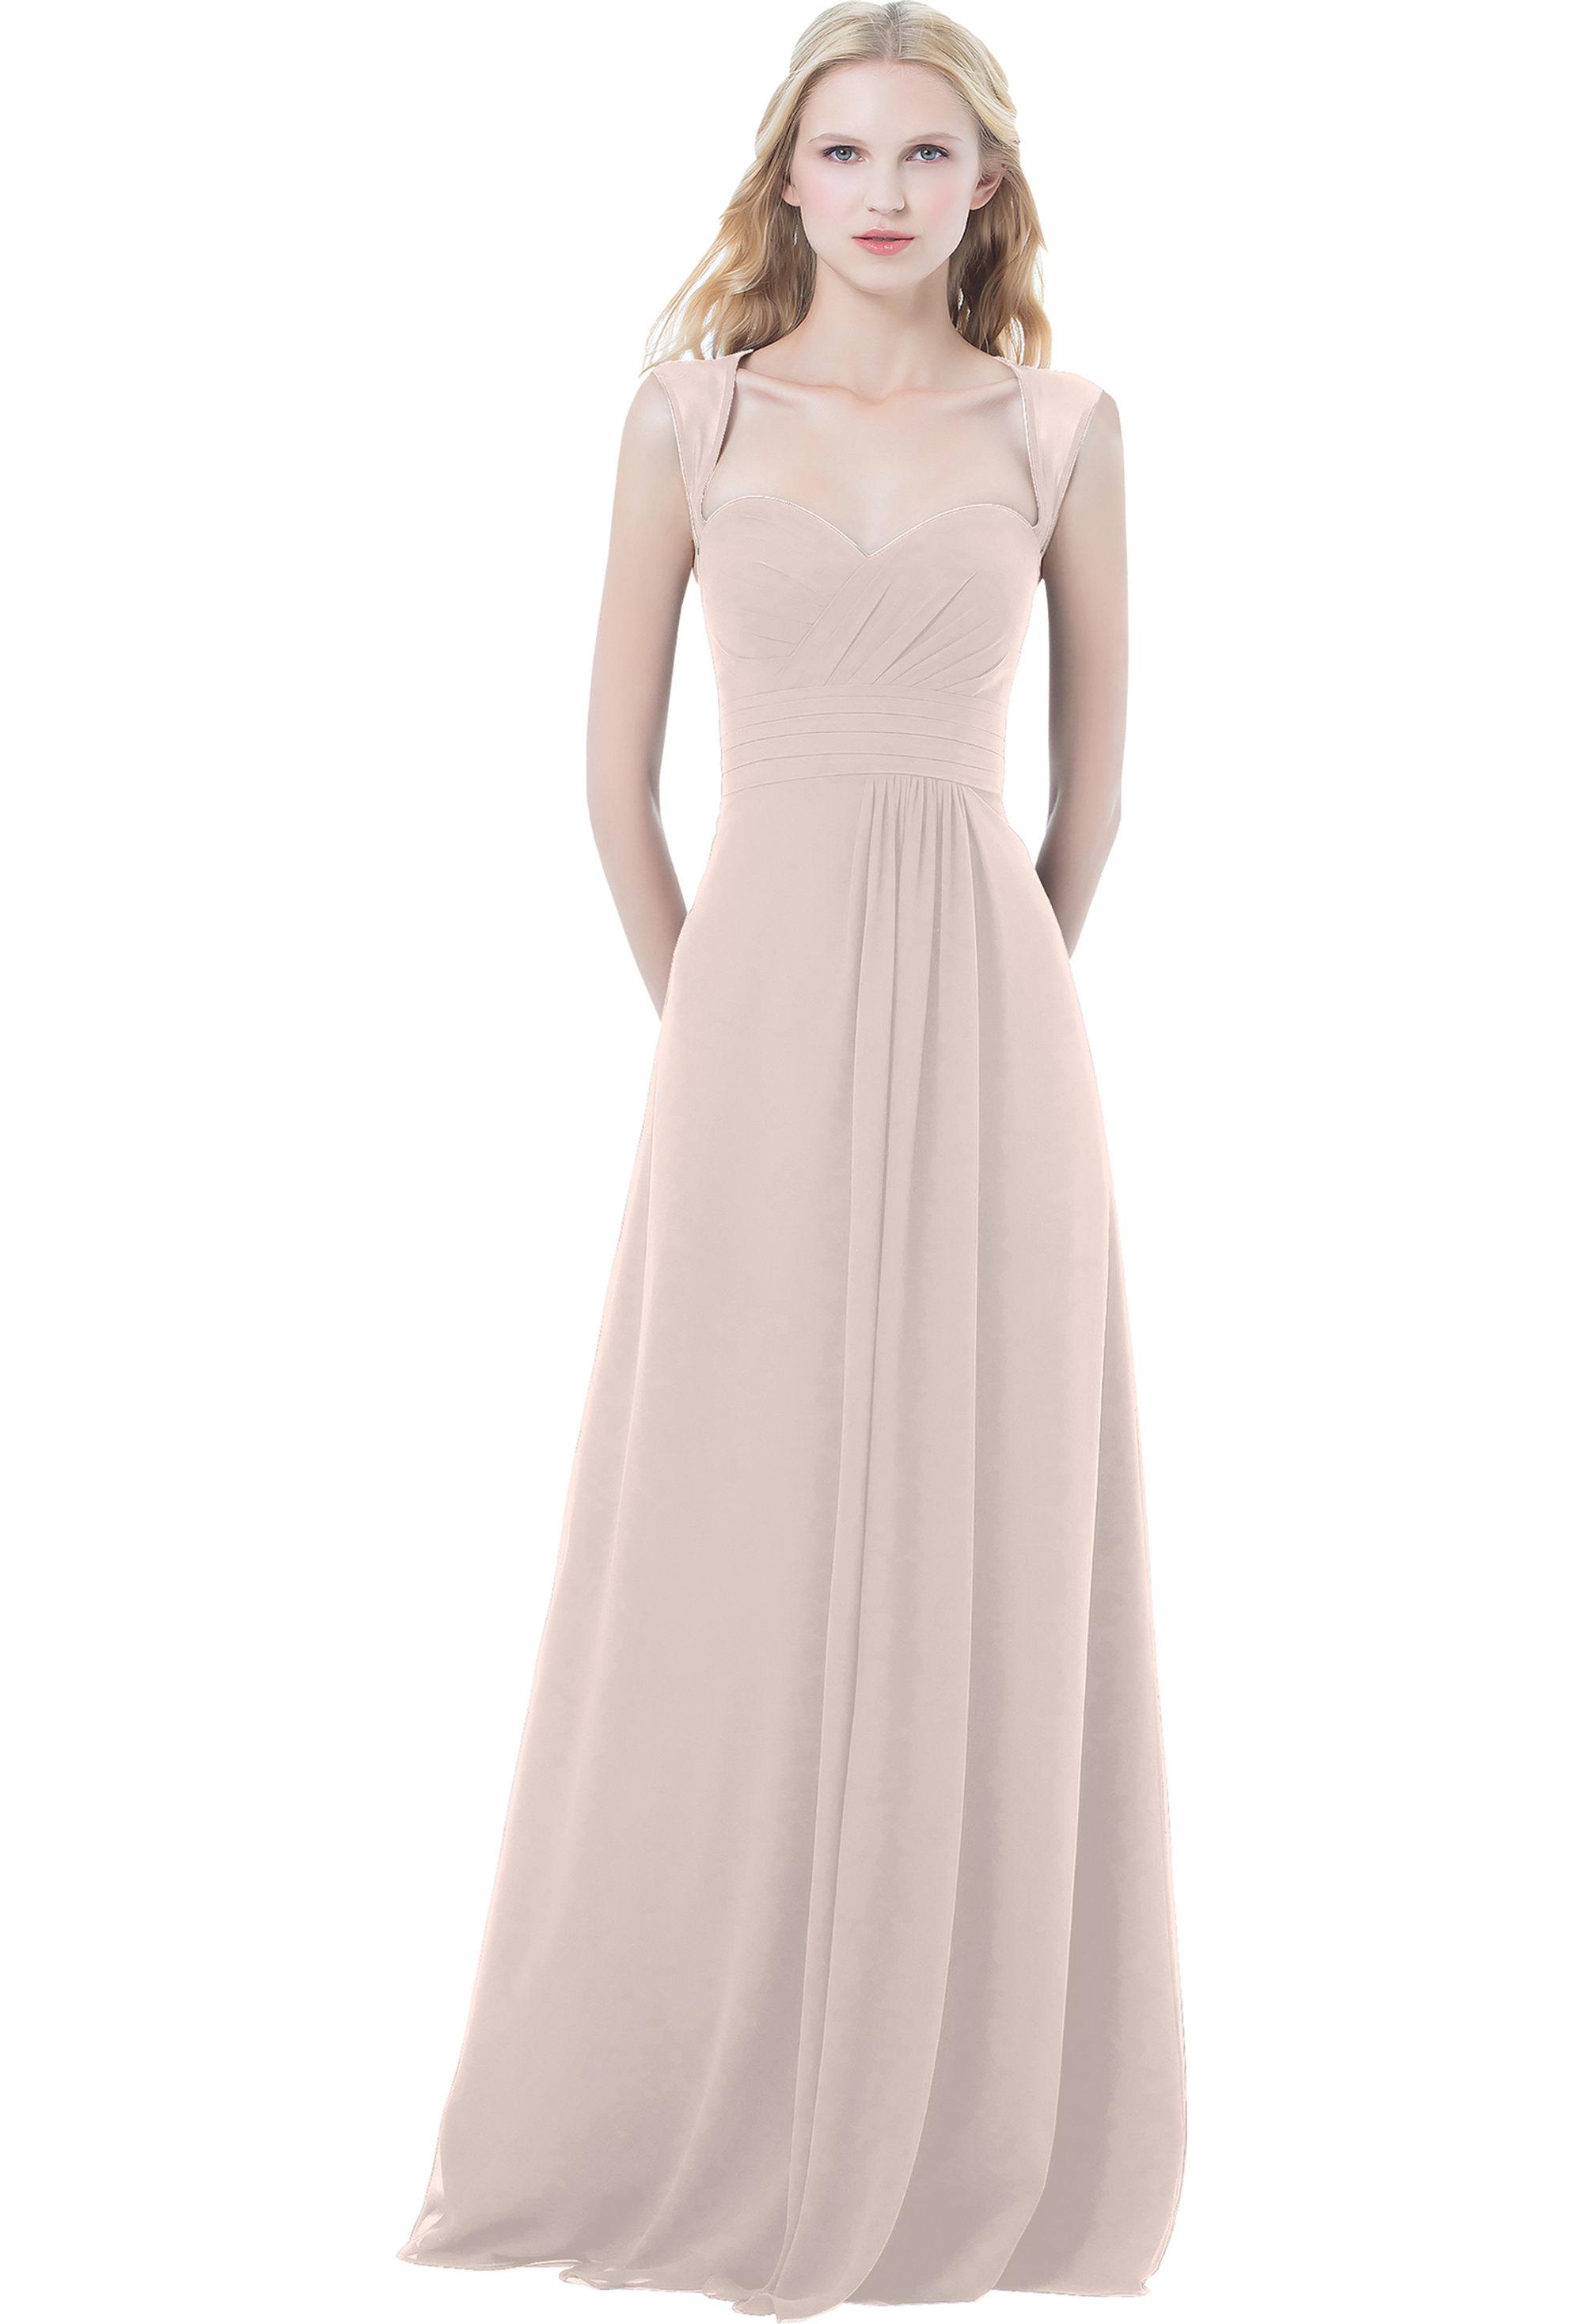 Bill Levkoff PETAL PINK Chiffon Sweetheart A-line gown, $220.00 Front